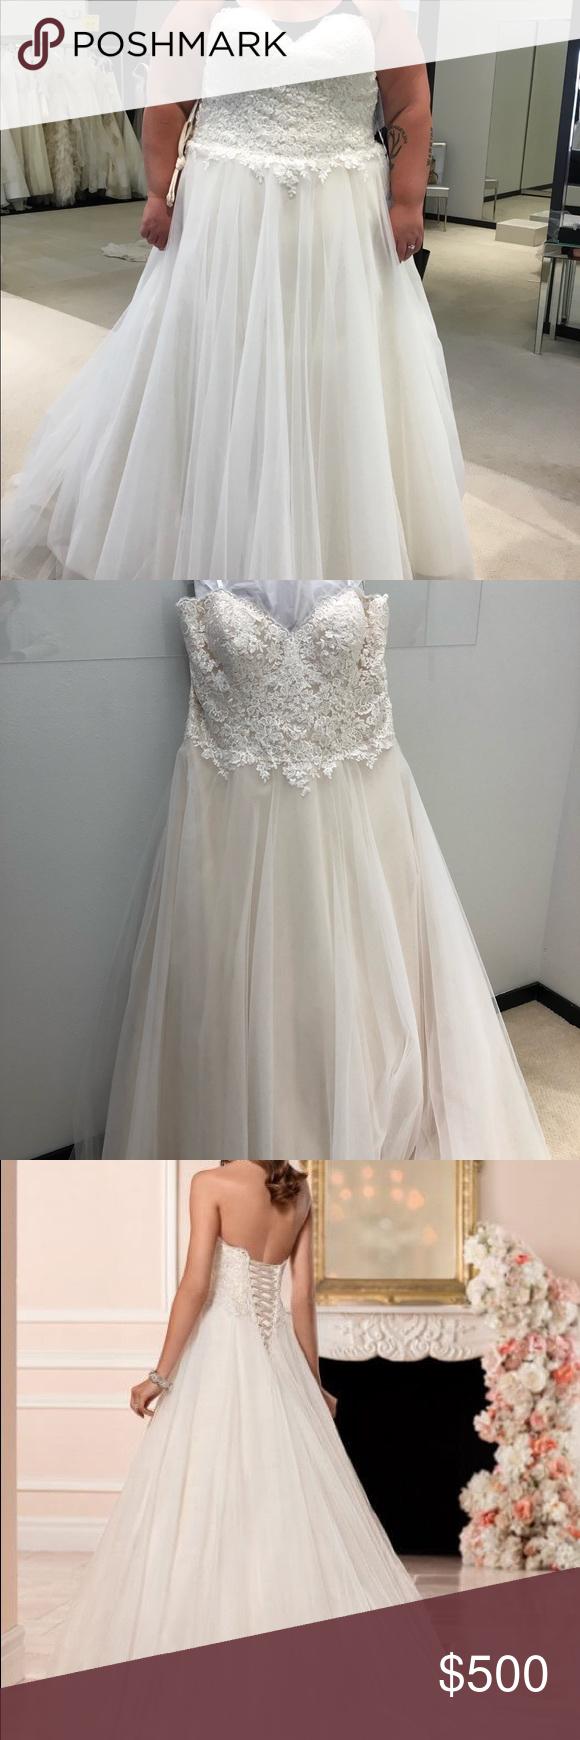 Size 24 wedding dress  Stella York Wedding Dress  Brand New NWT  Pinterest  Wedding